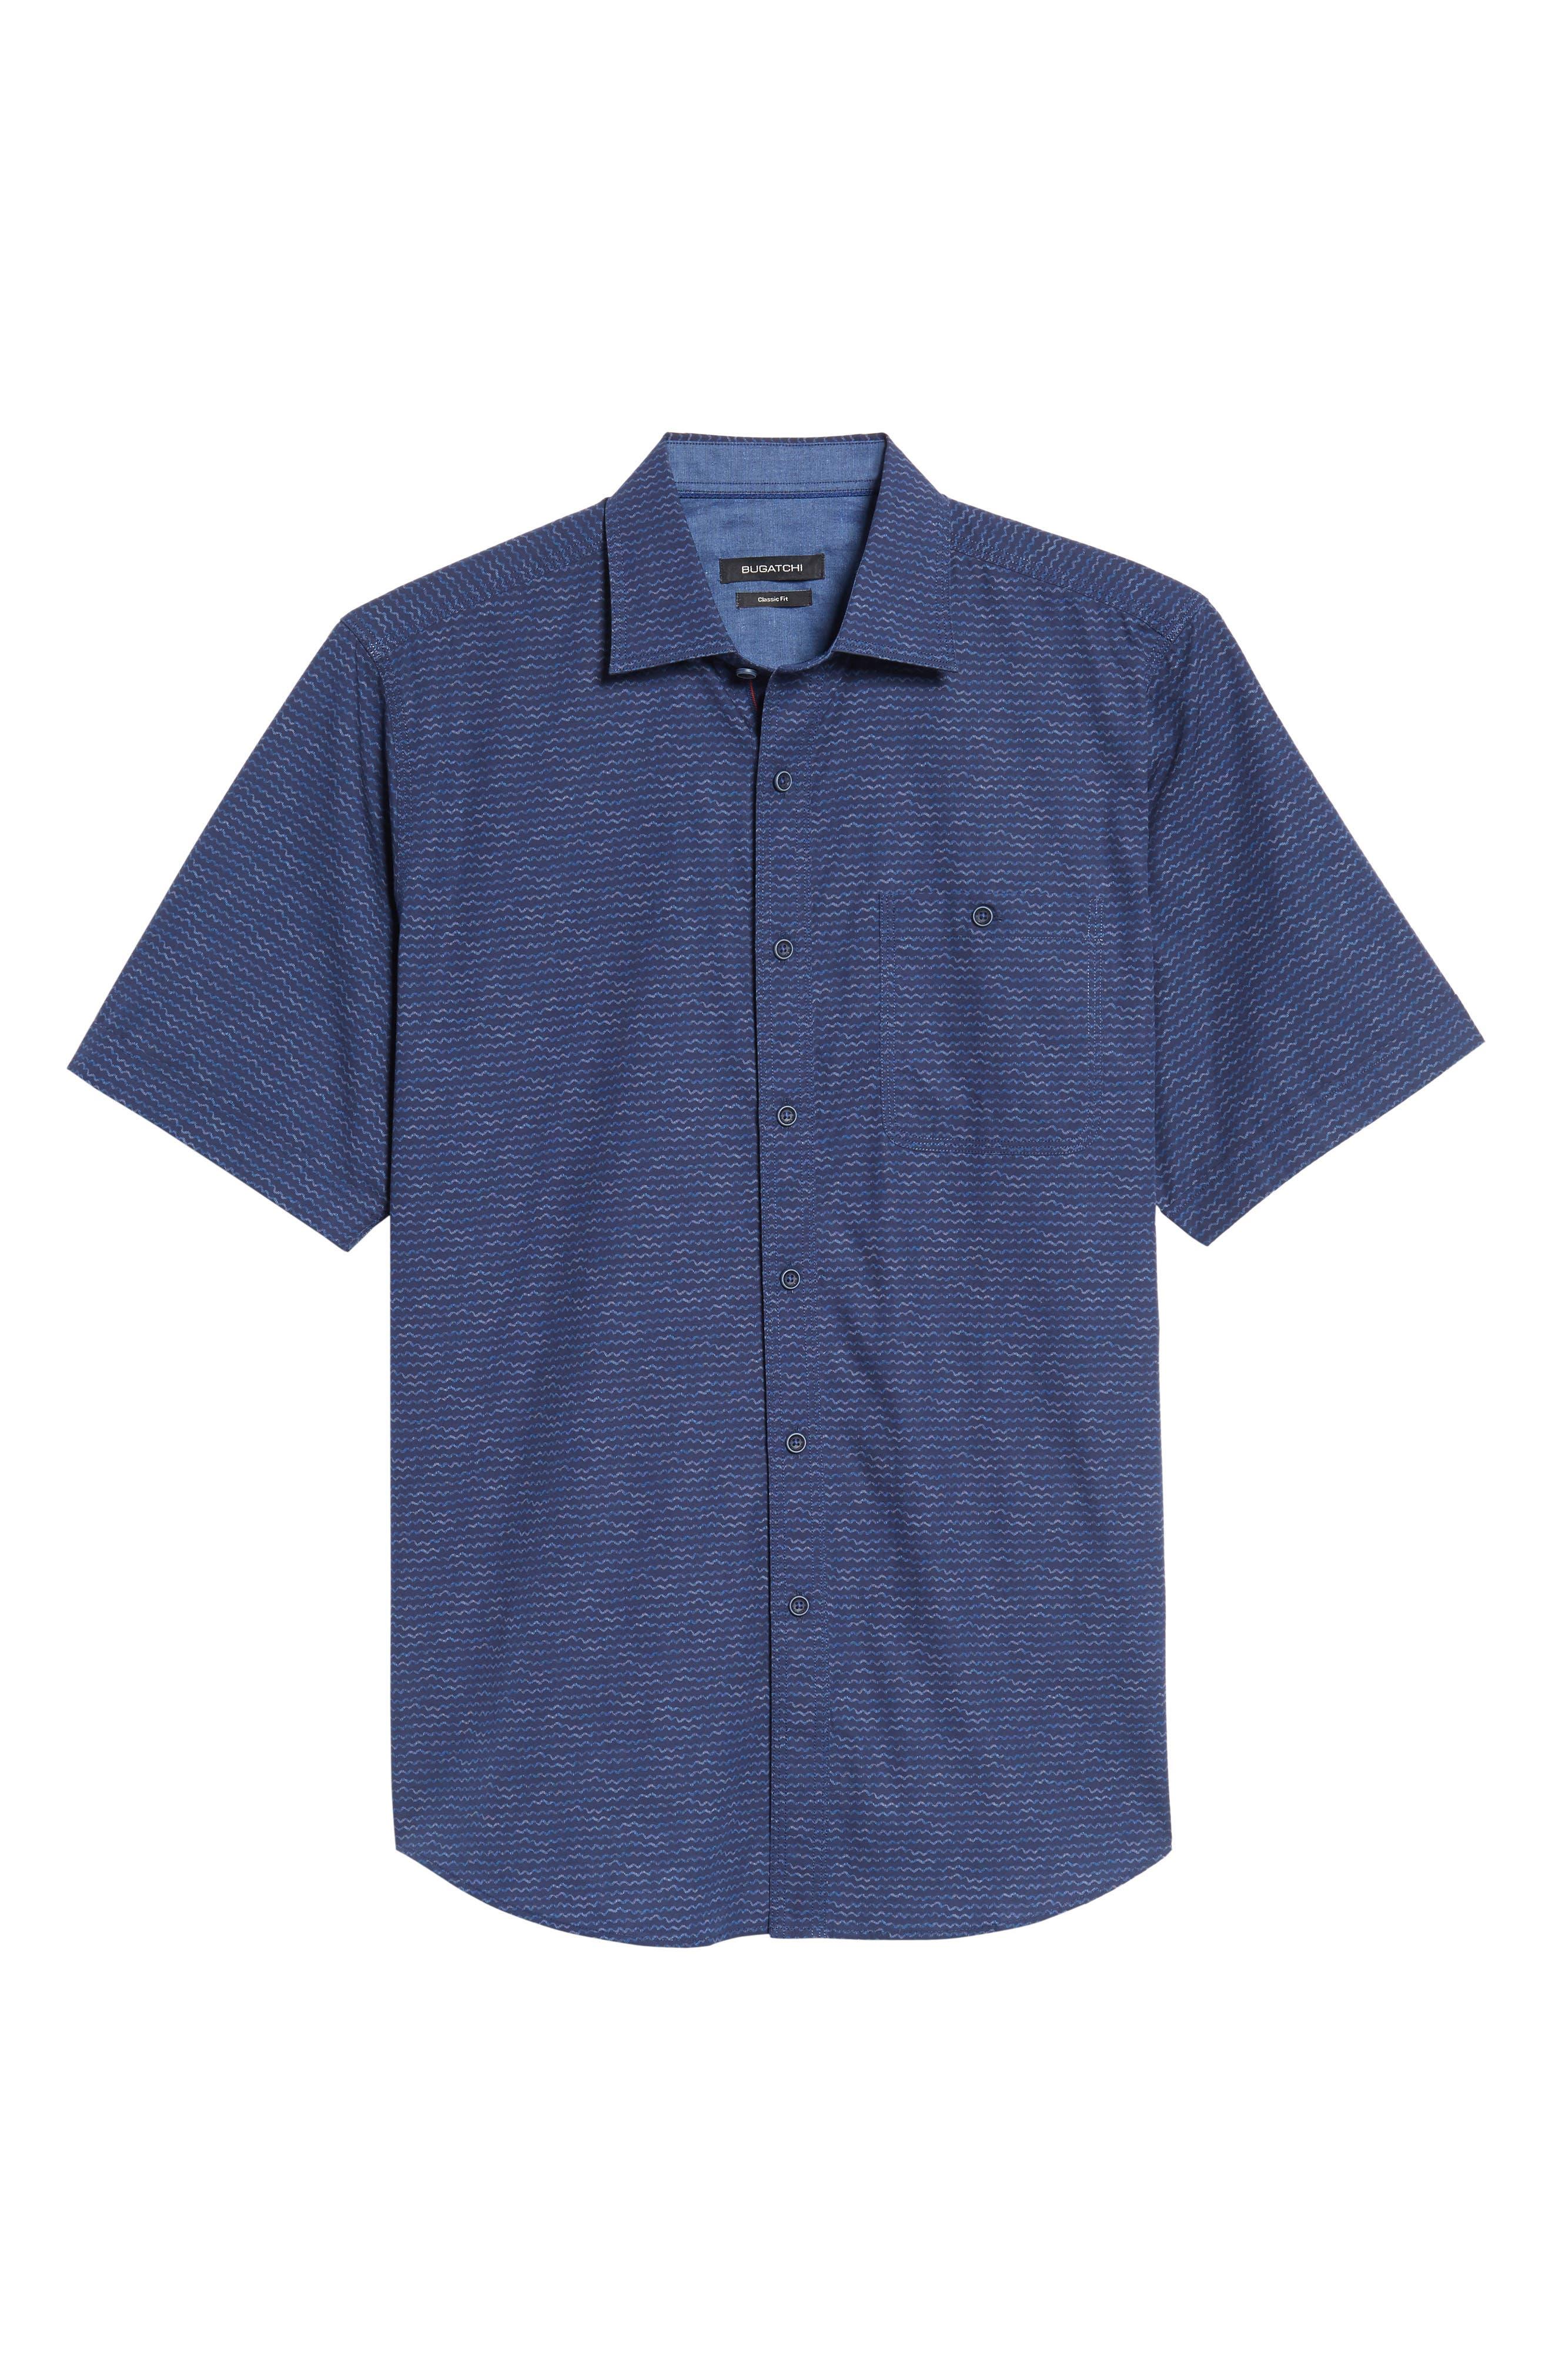 Classic Fit Sport Shirt,                             Alternate thumbnail 6, color,                             410